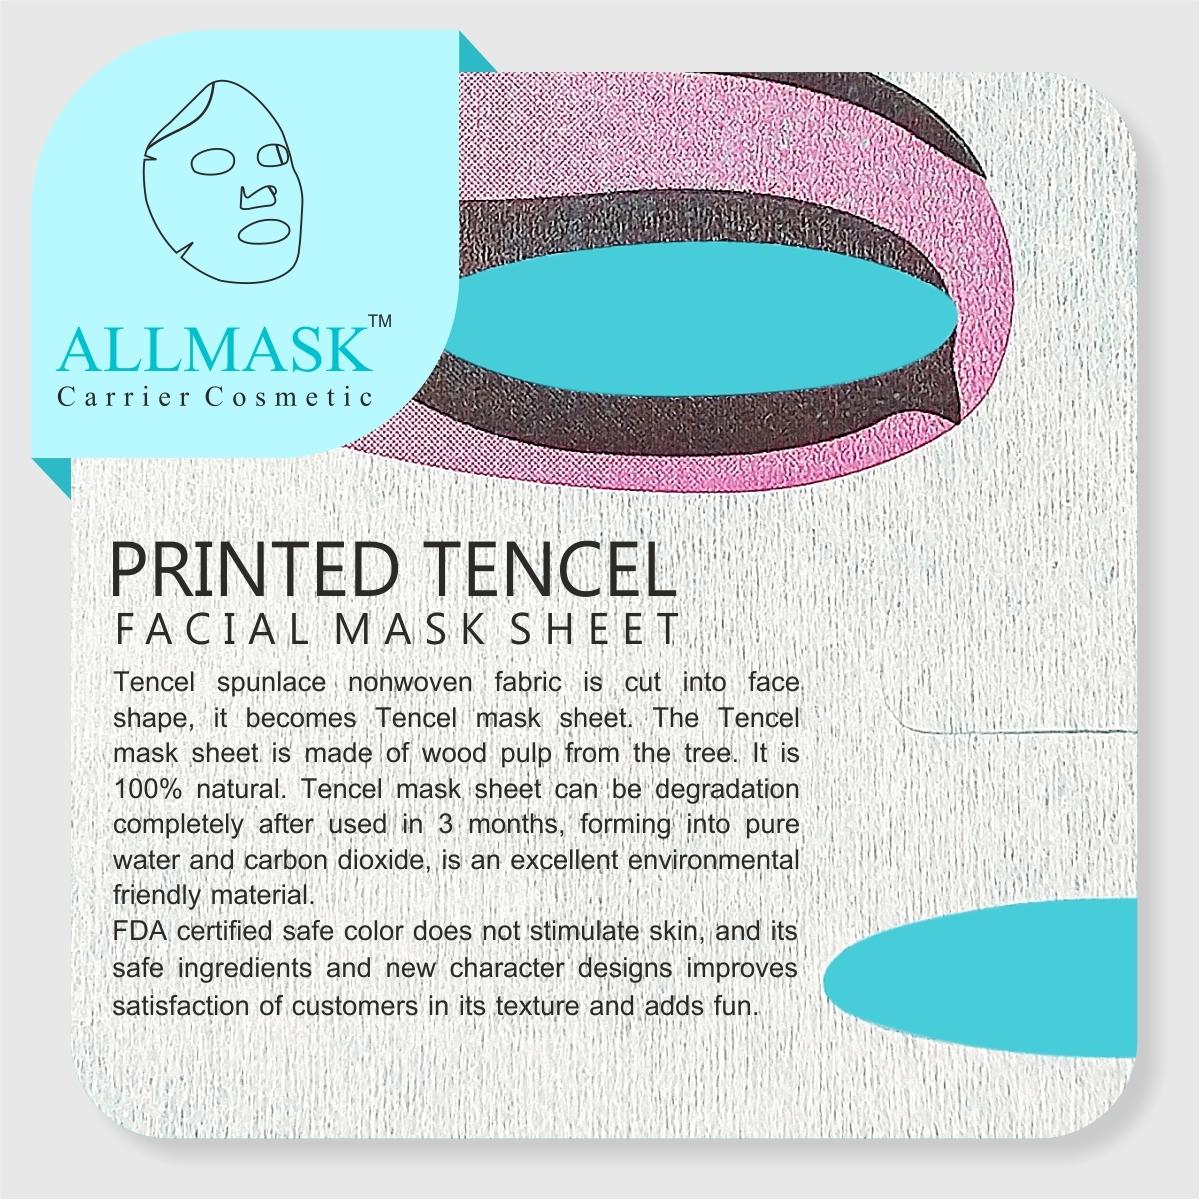 Tencel/Invisible Eye Printed Facial Mask Sheet - 100% Original - ODM/OEM Customization Available